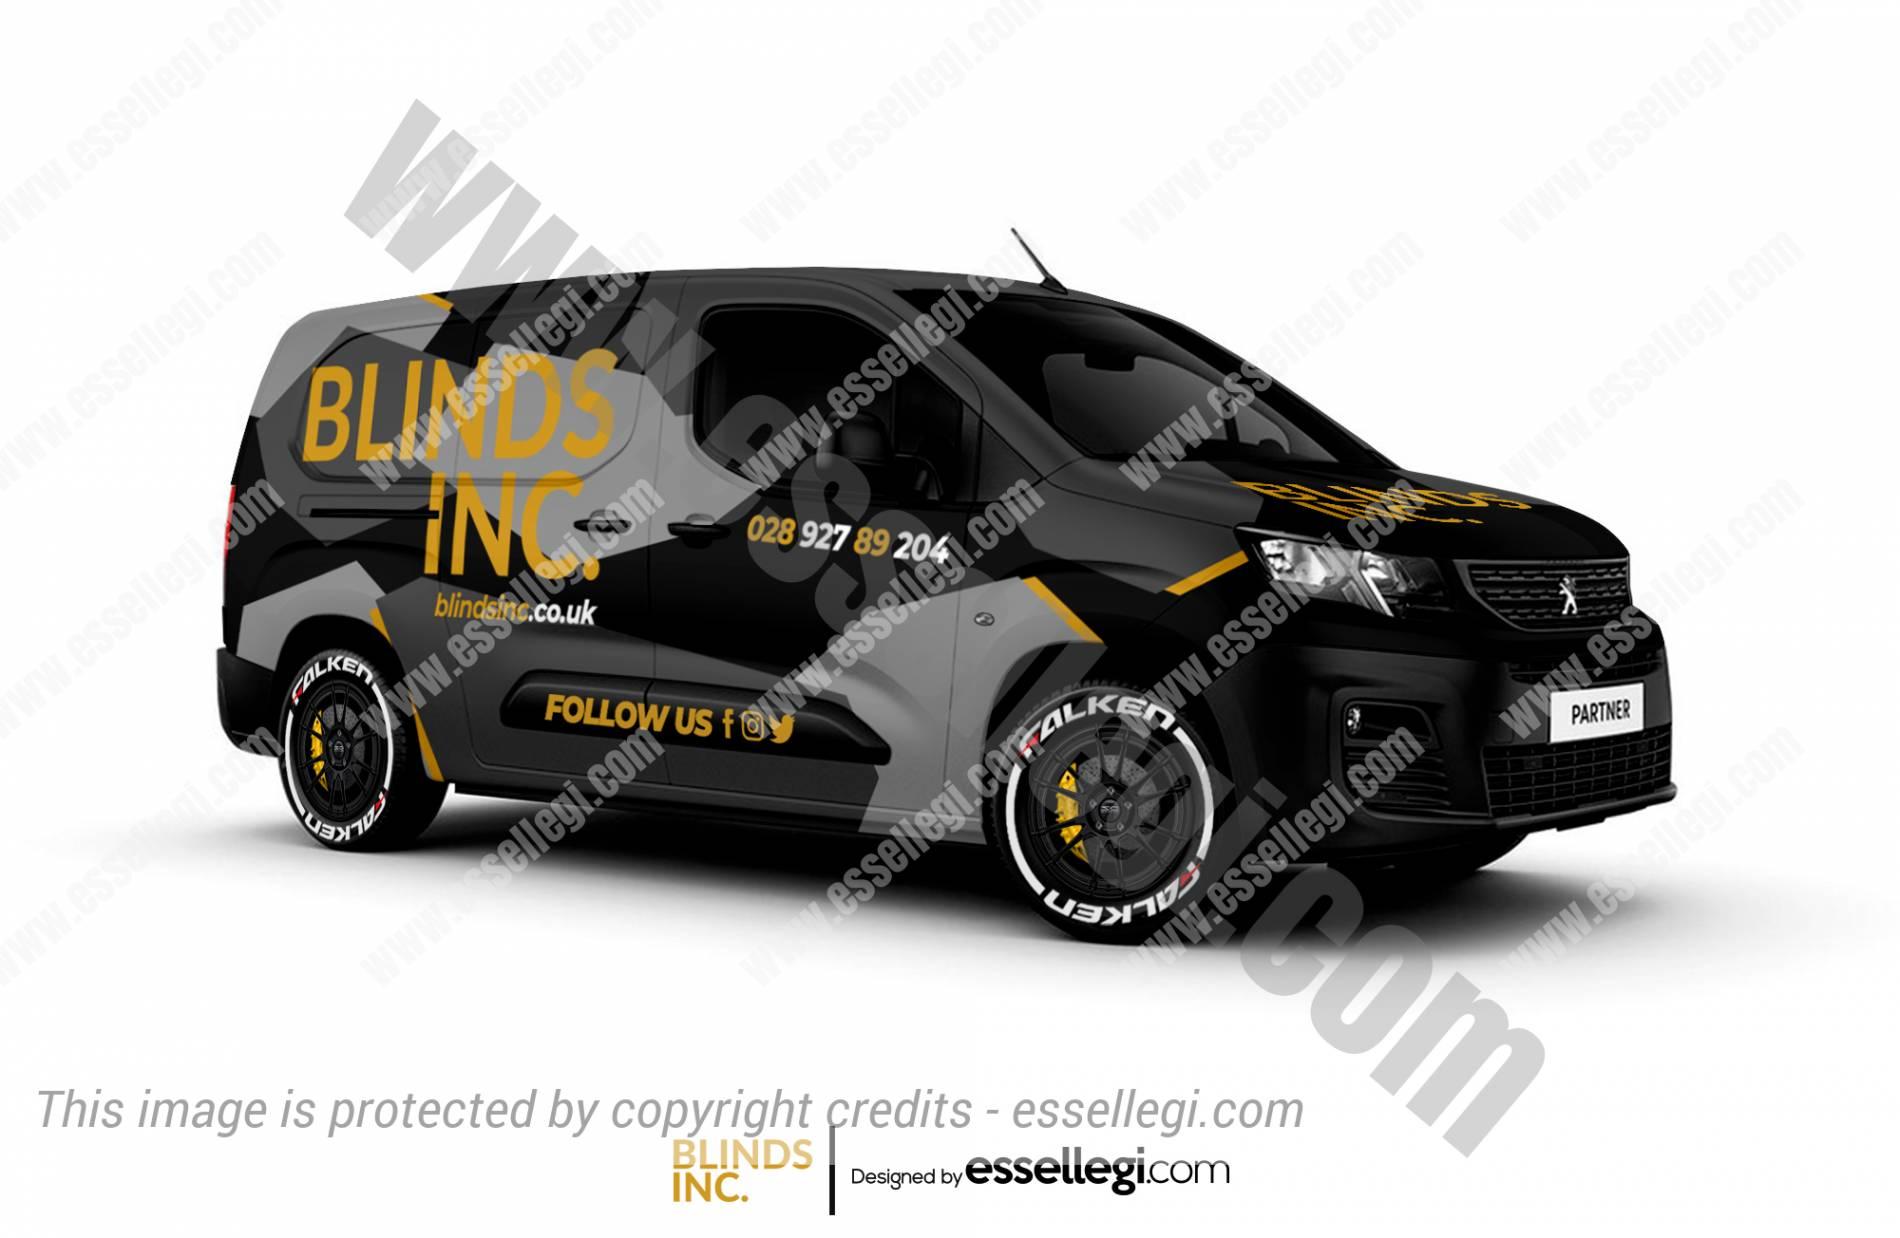 Peugeot Partner Wrap Design. Peugeot Partner | Van Wrap Design by Essellegi. Van Signs, Van Signage, Van Wrapping, Van Signwriting, Van Wrap Designer, Signs for Van, Van Logo, Van Graphic by Essellegi.